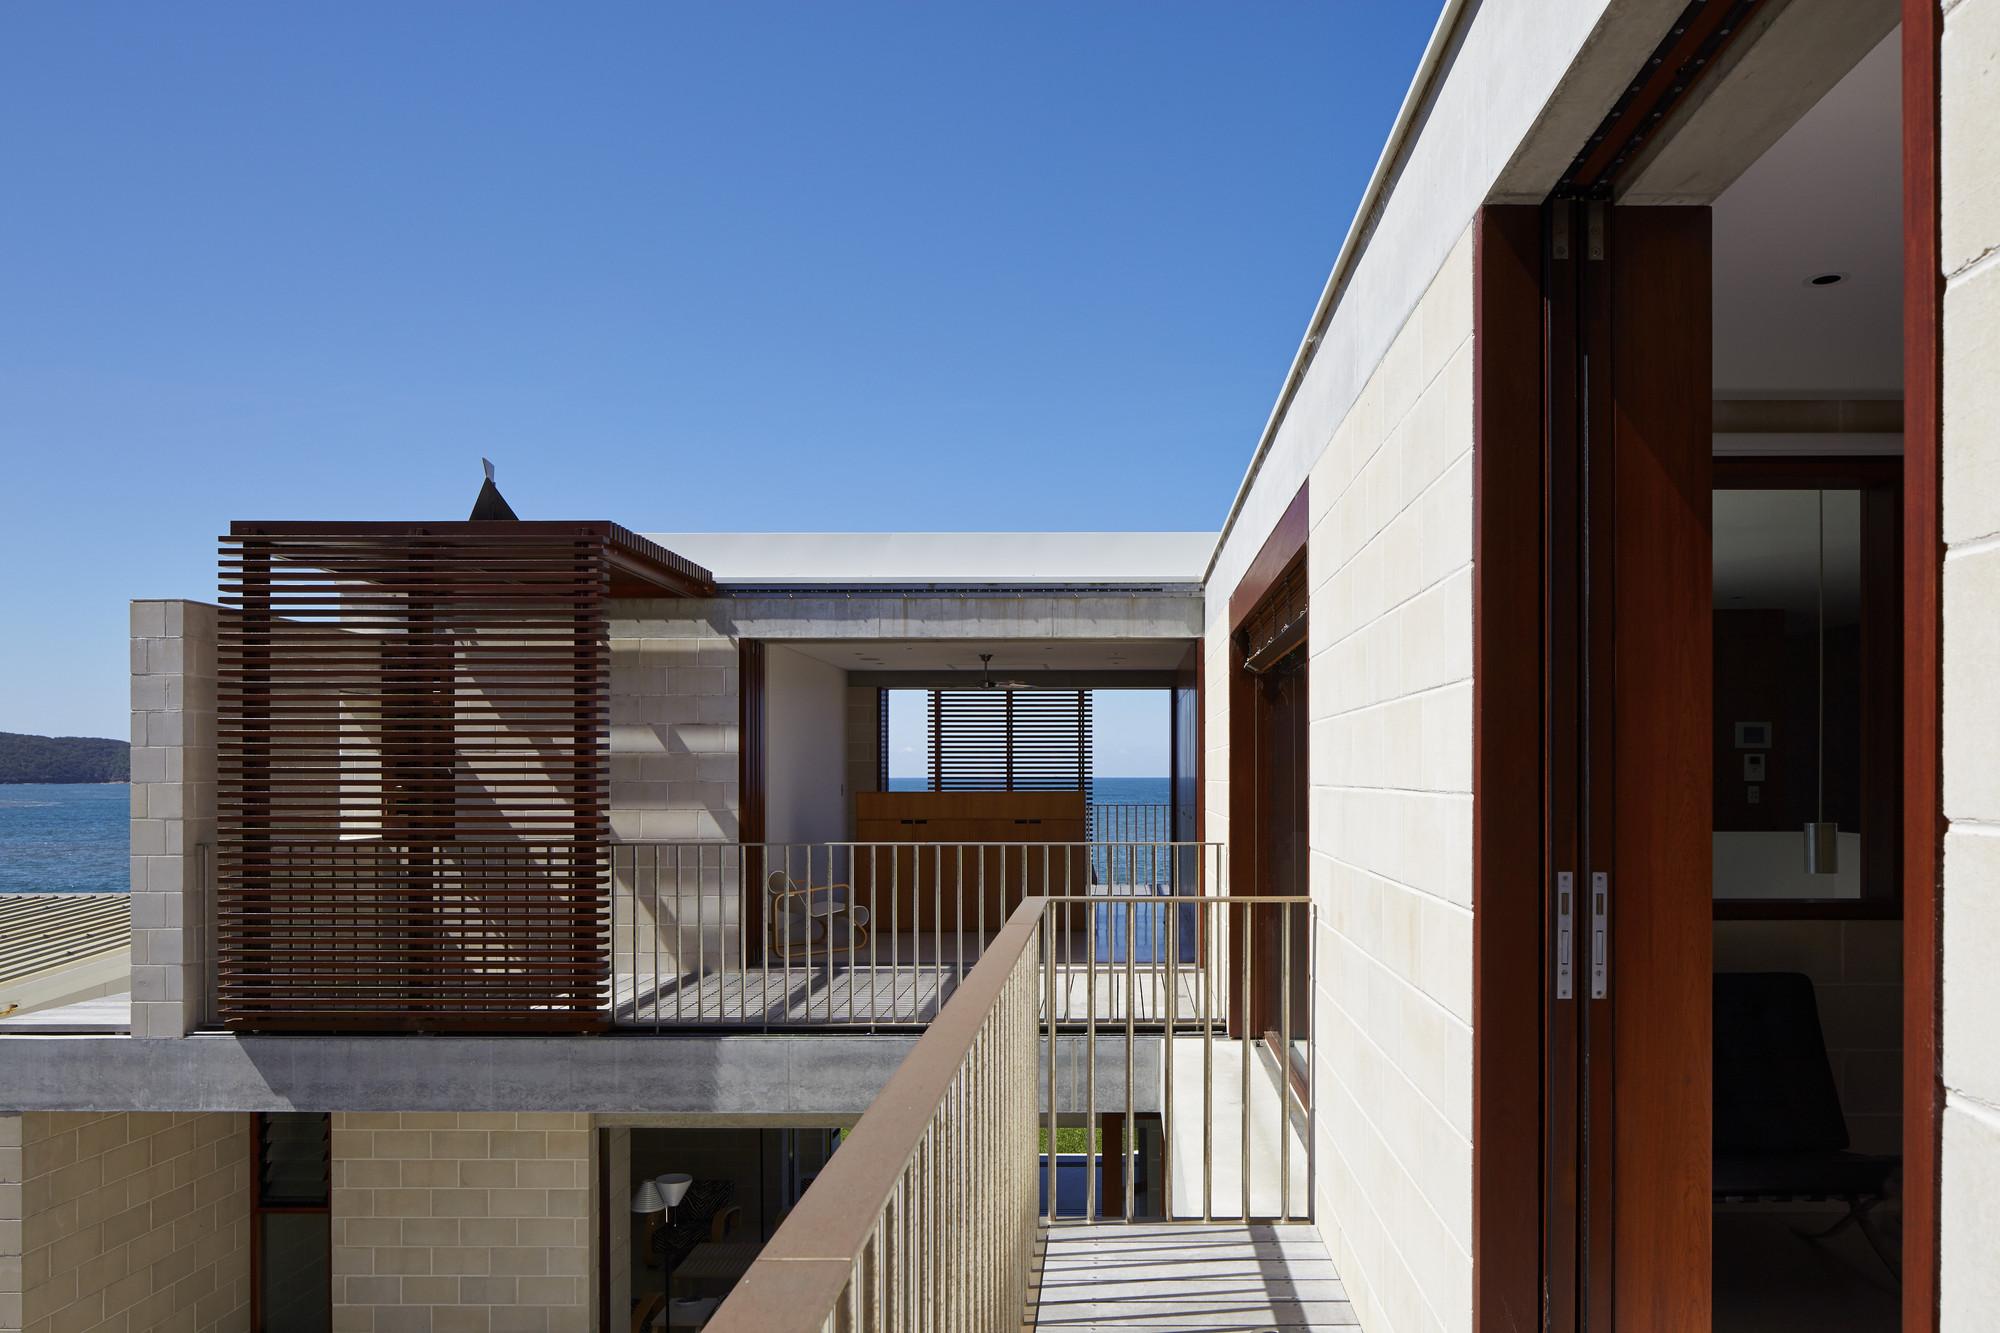 gallery of block house porebski architects 7. Black Bedroom Furniture Sets. Home Design Ideas